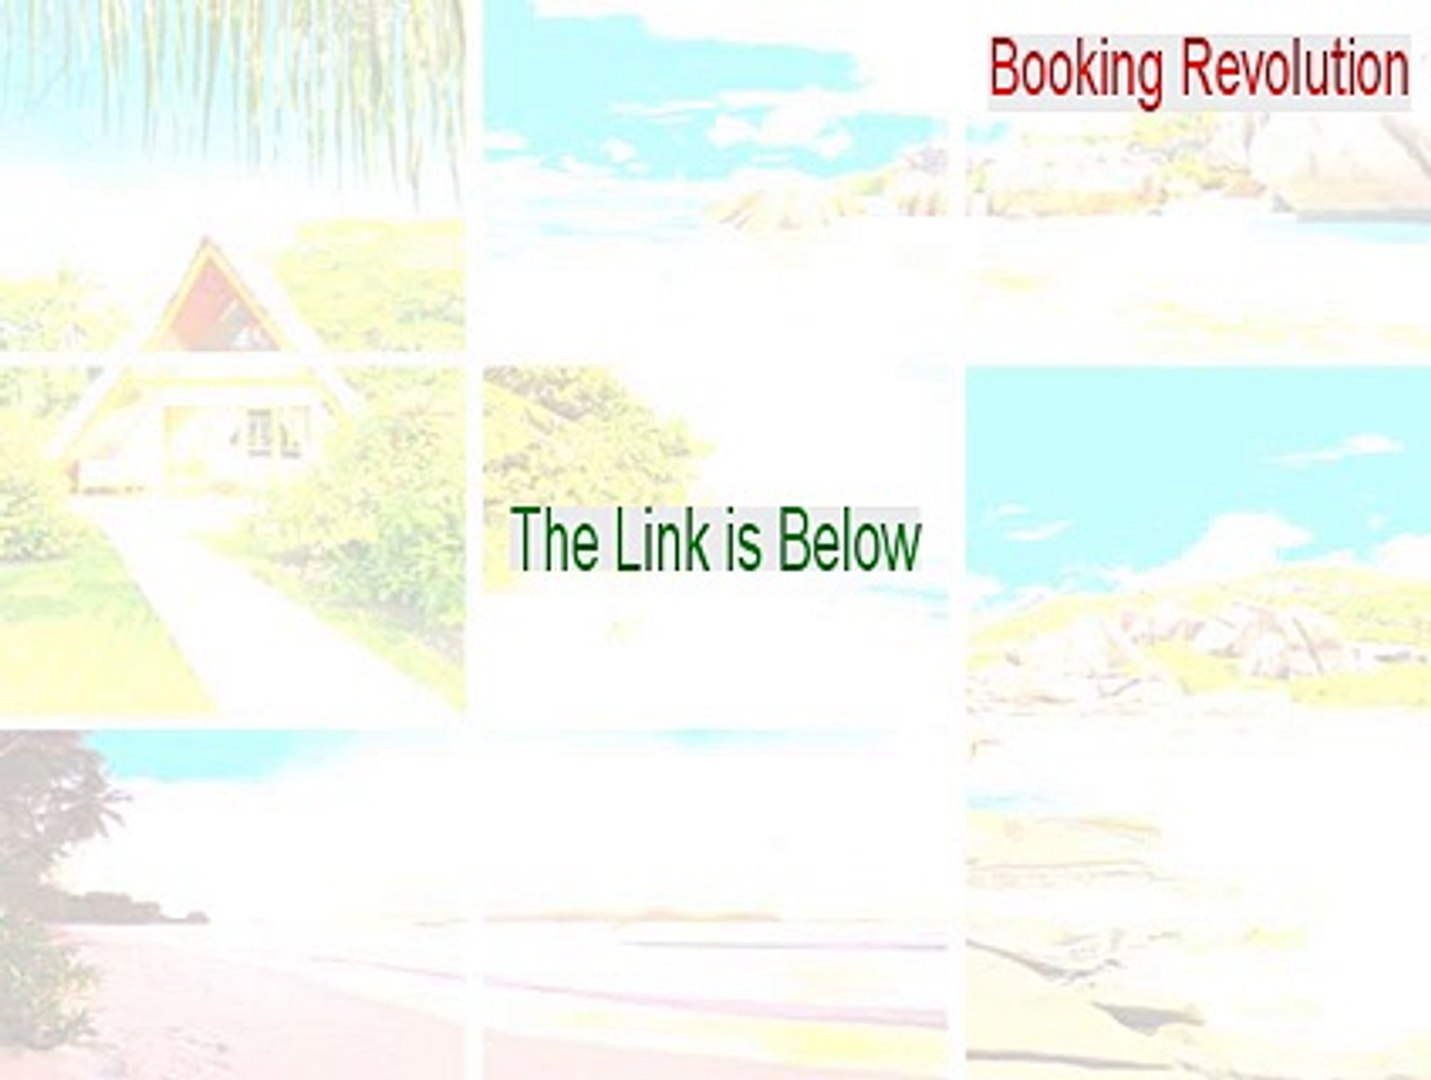 Booking Revolution Full Download - Instant Download 2015